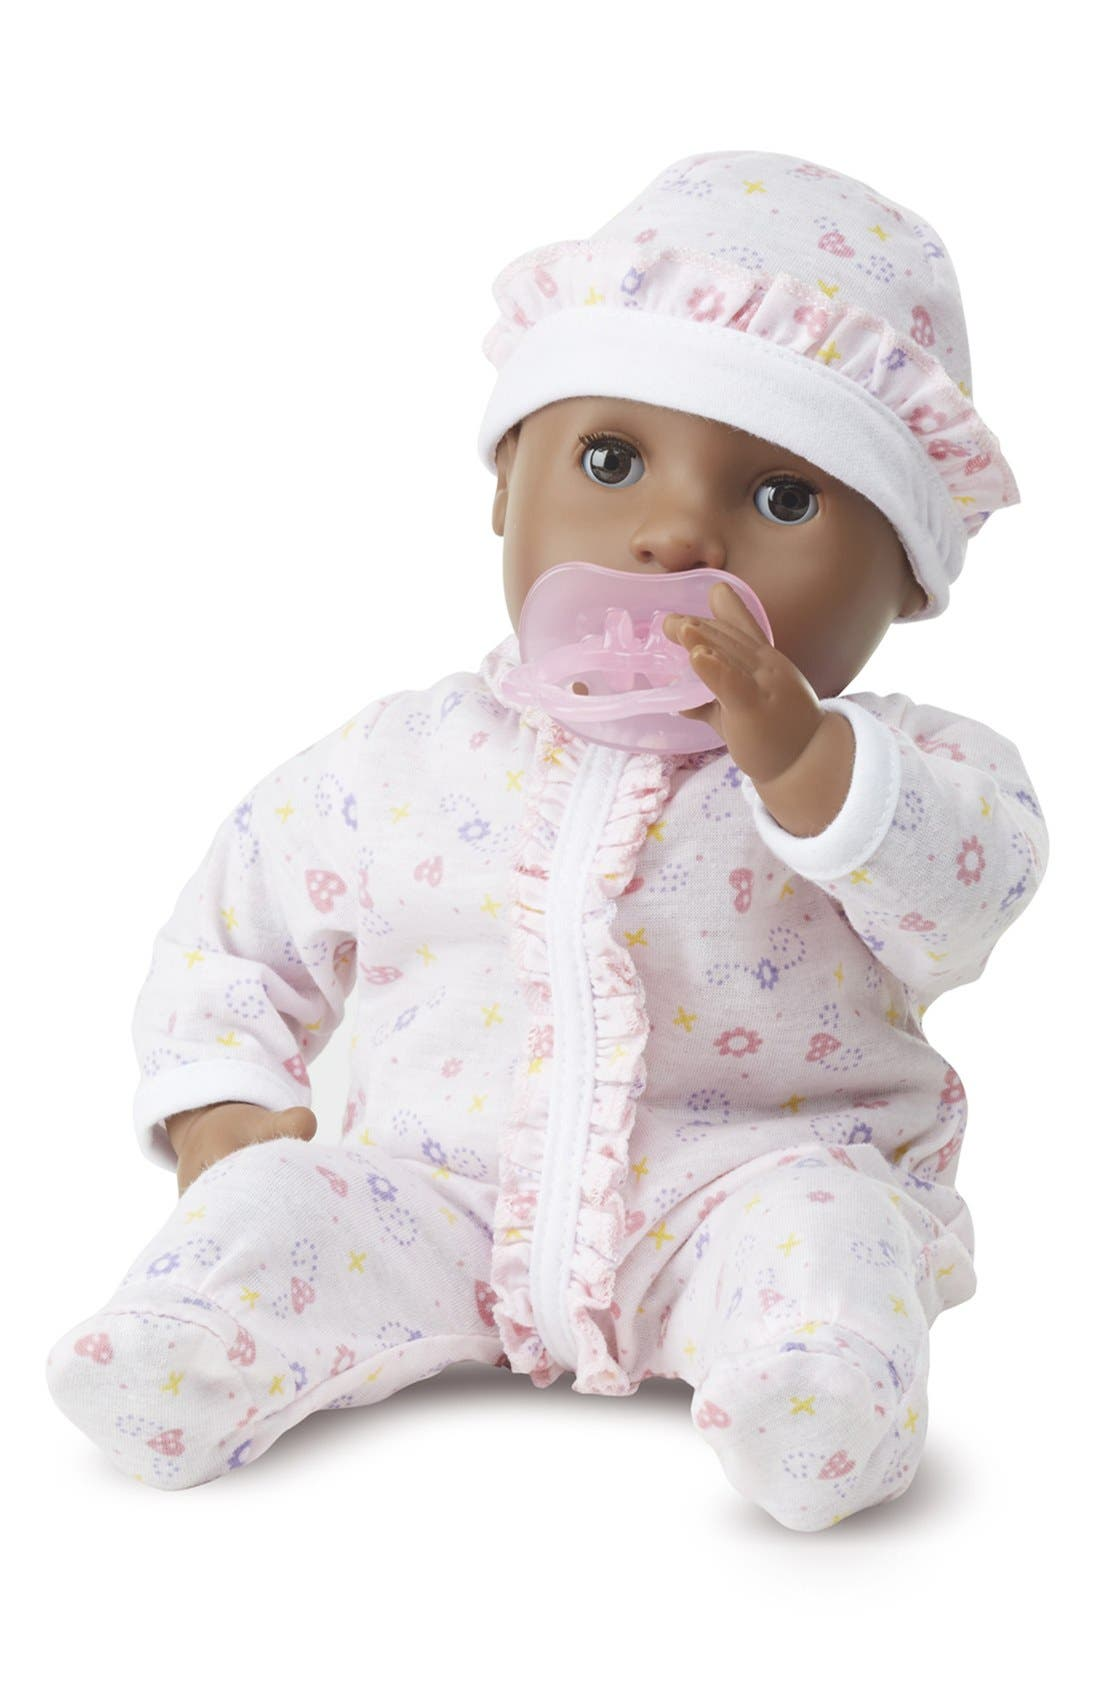 Melissa & Doug 'Mine to Love - Gabrielle' Baby Doll